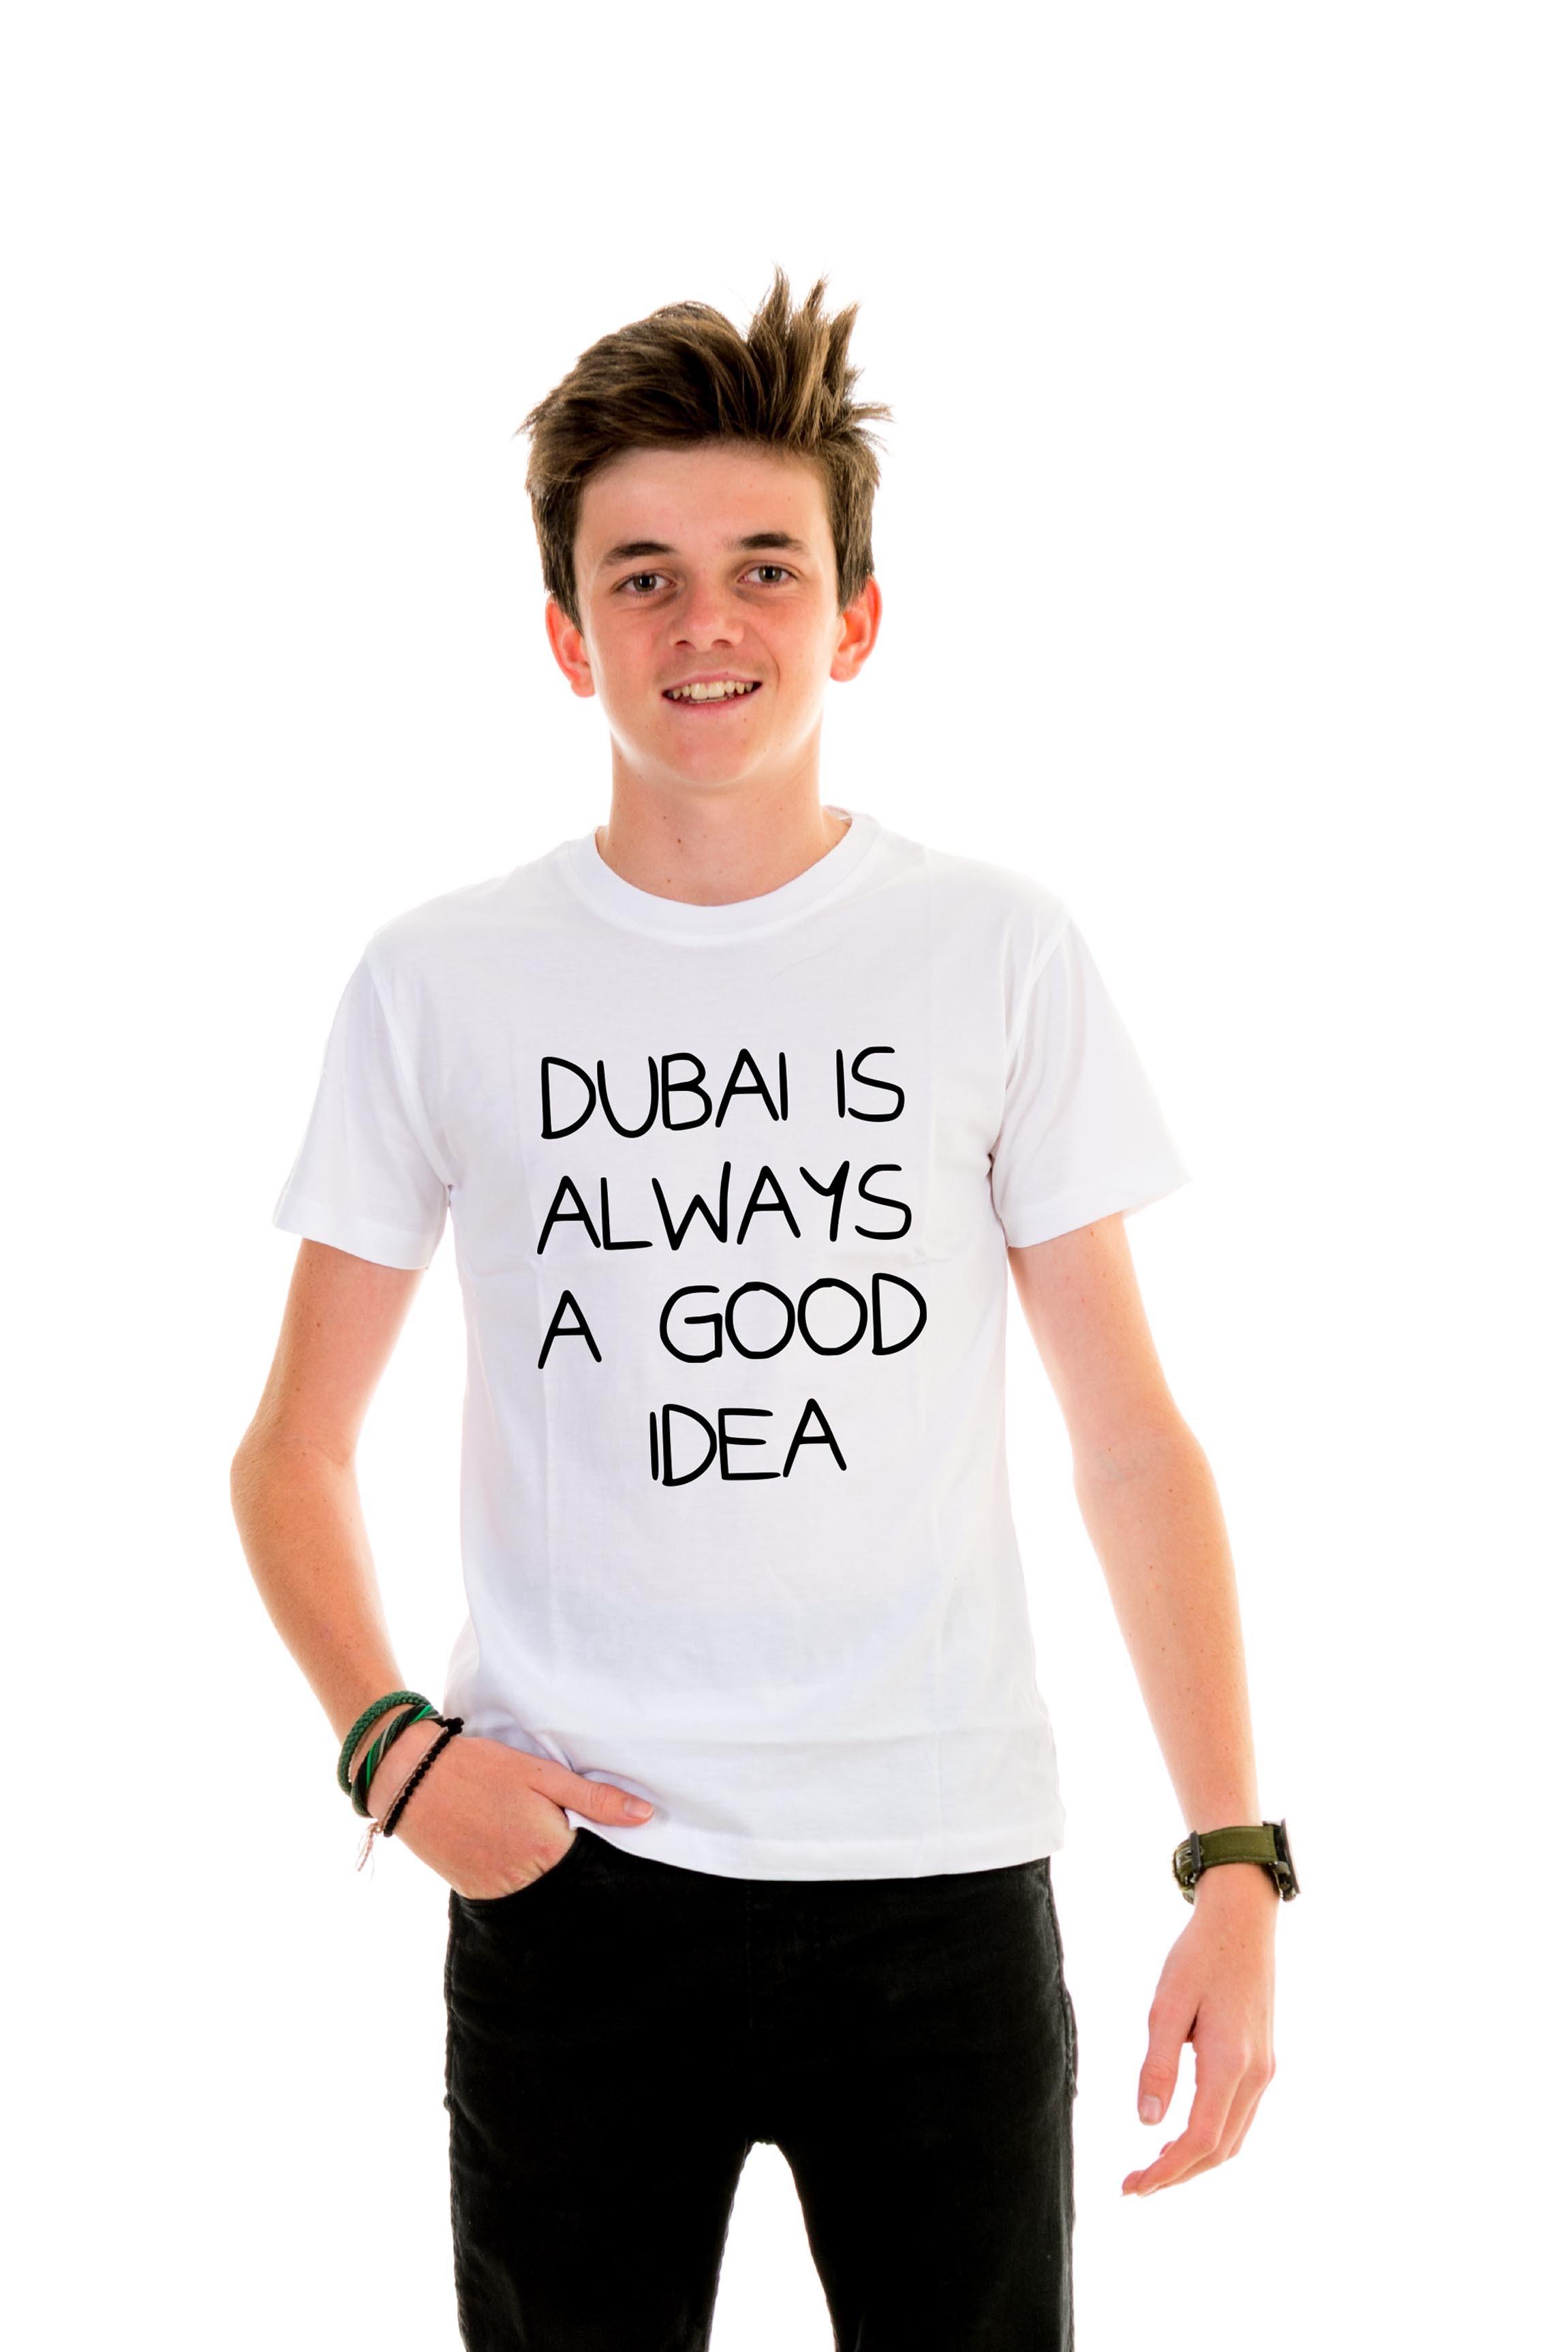 94ea6090d T-shirt Kid Dubai is always a good idea - Kids - T-shirts - Shop